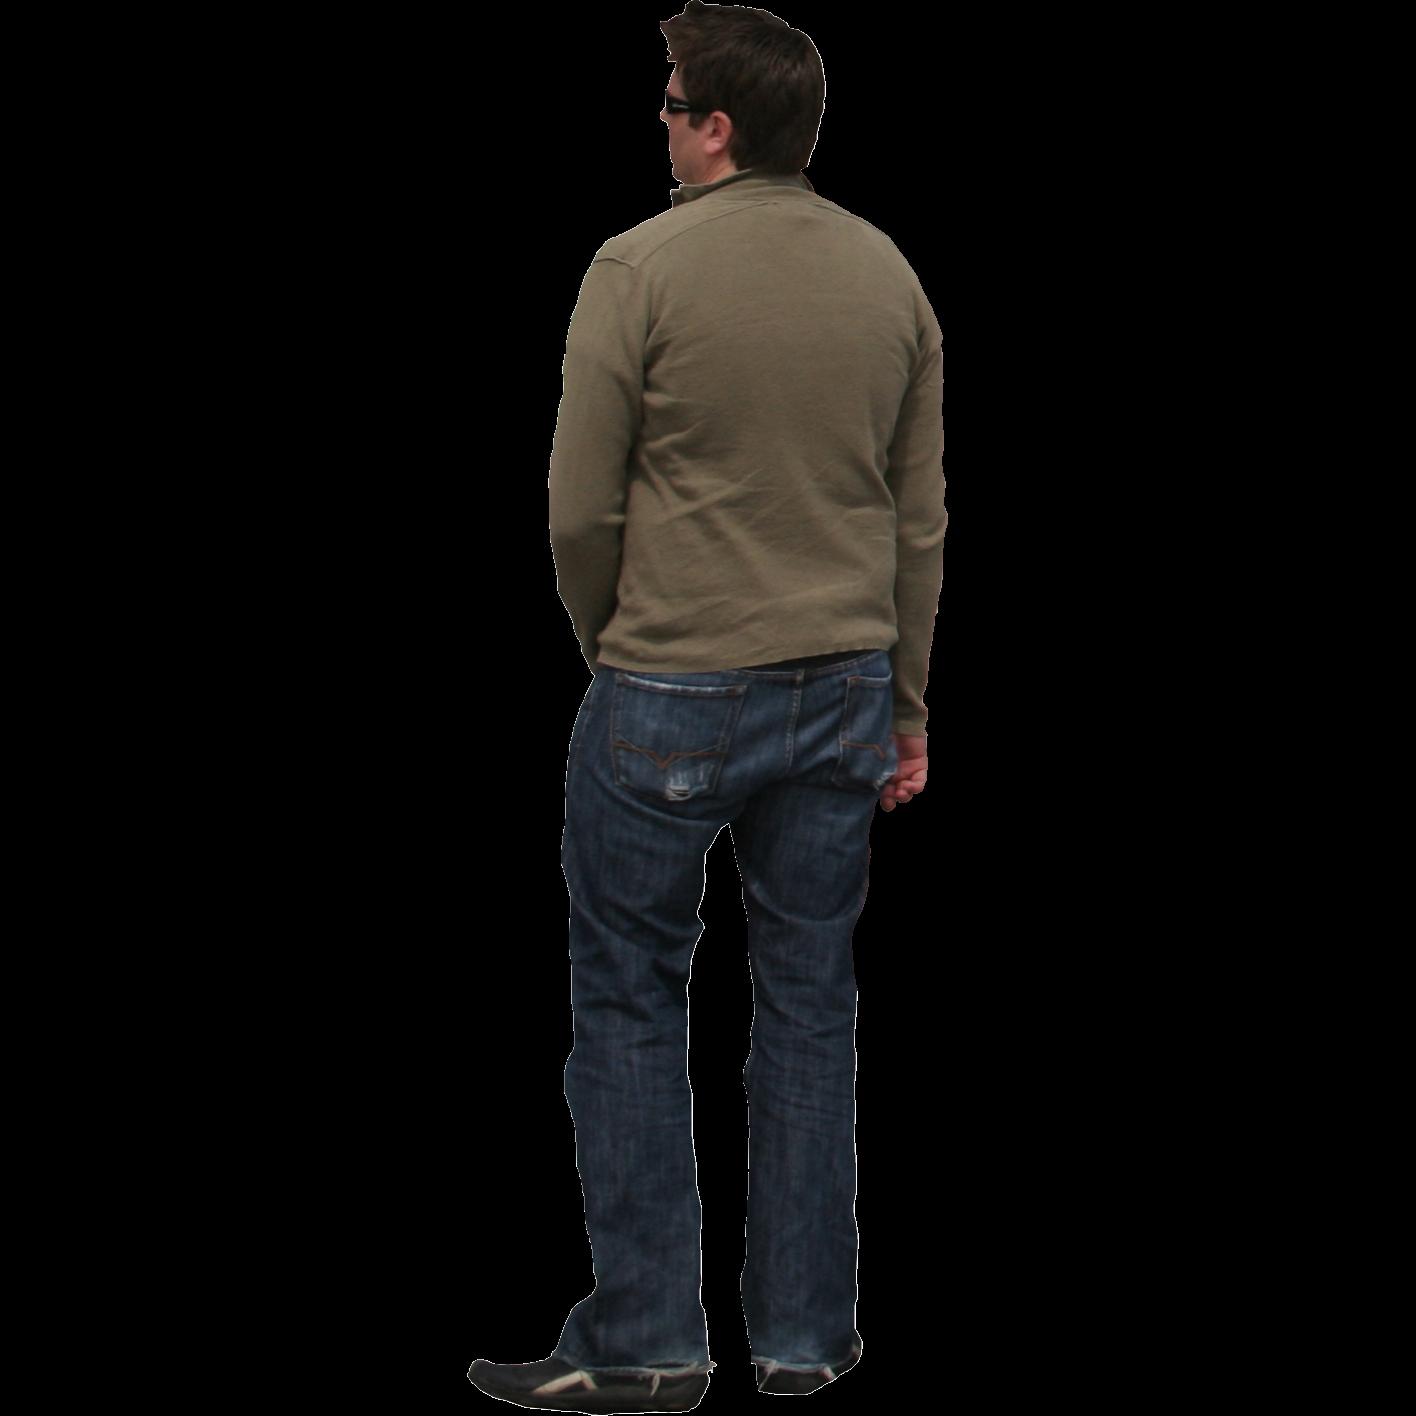 Http Www Immediateentourage Com Wp Content Uploads 2012 01 Back View Of Man In Jeans Png People Art Tutorials Man